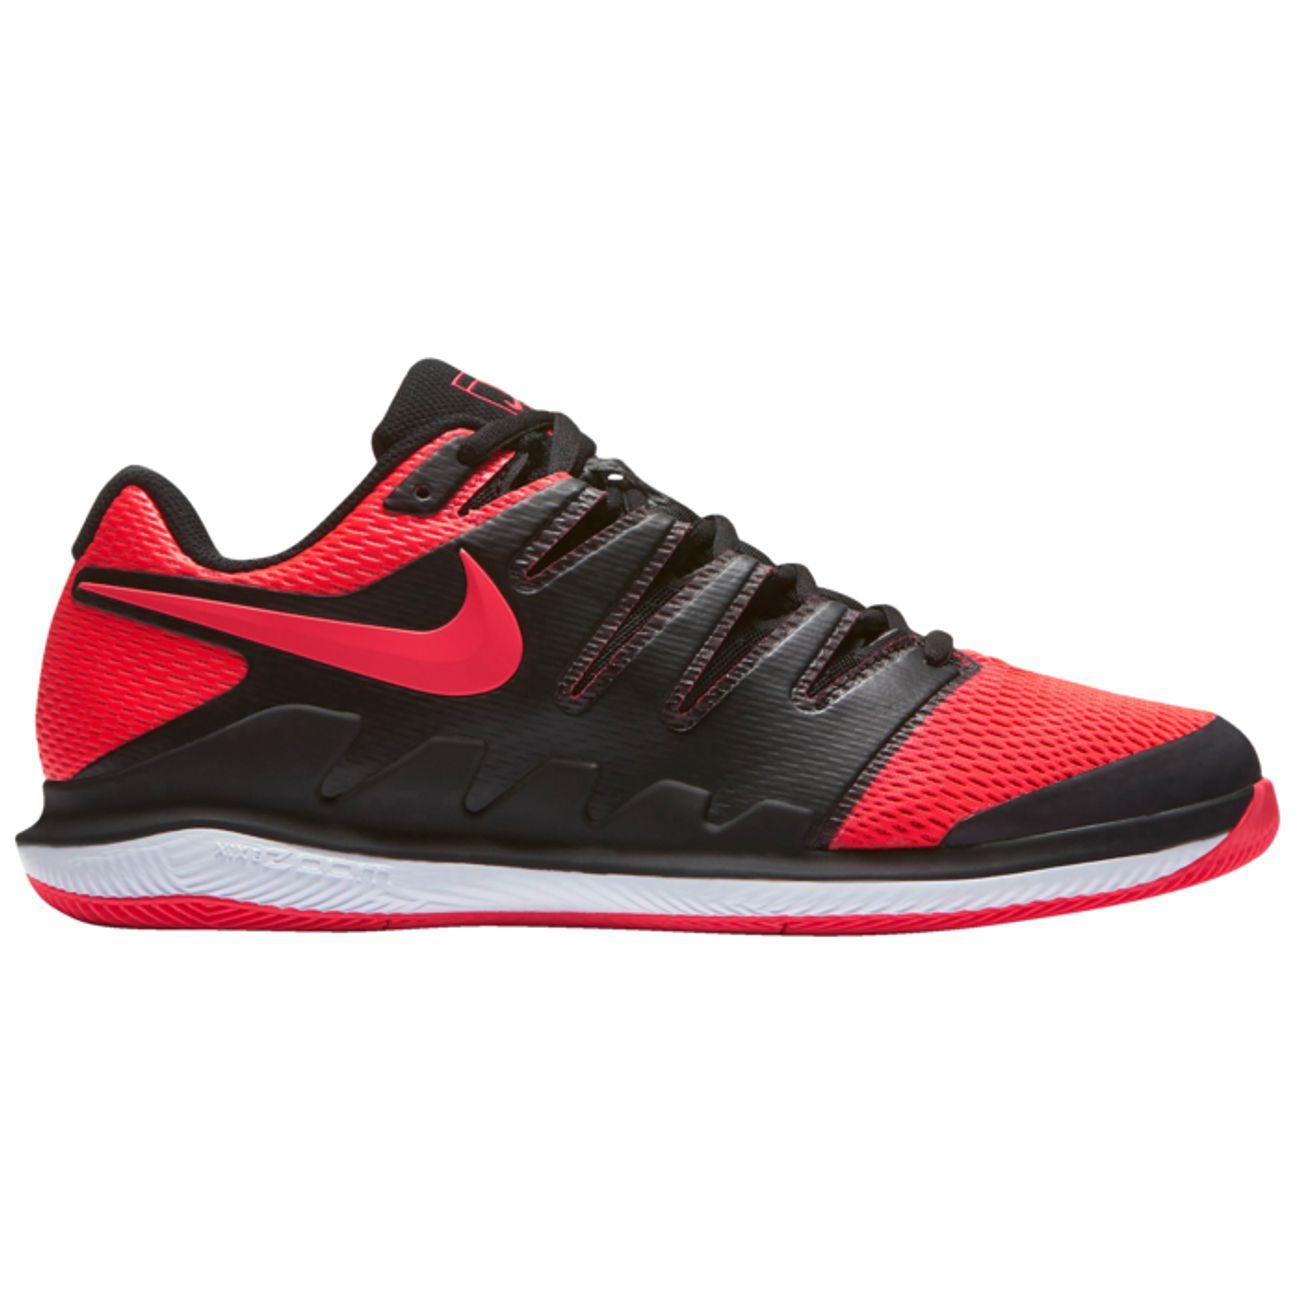 premium selection f0e4d 46e15 Chaussures de tennis NIKE NIKE AIR ZOOM VAPOR X HC ...